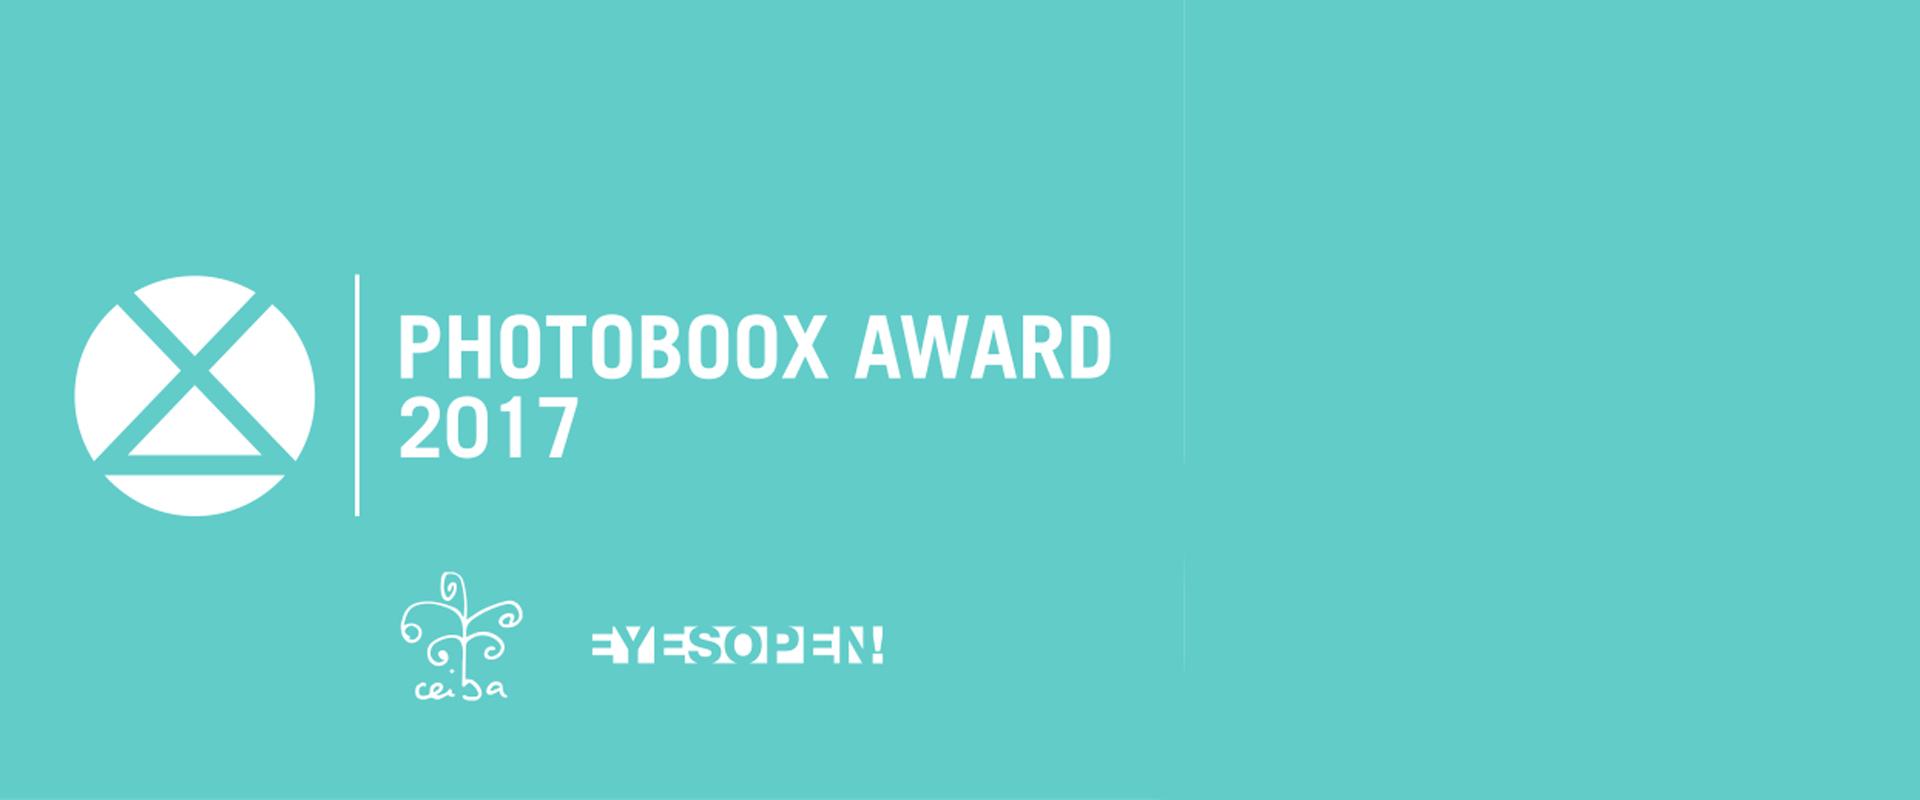 PhotoBoox Award 2017